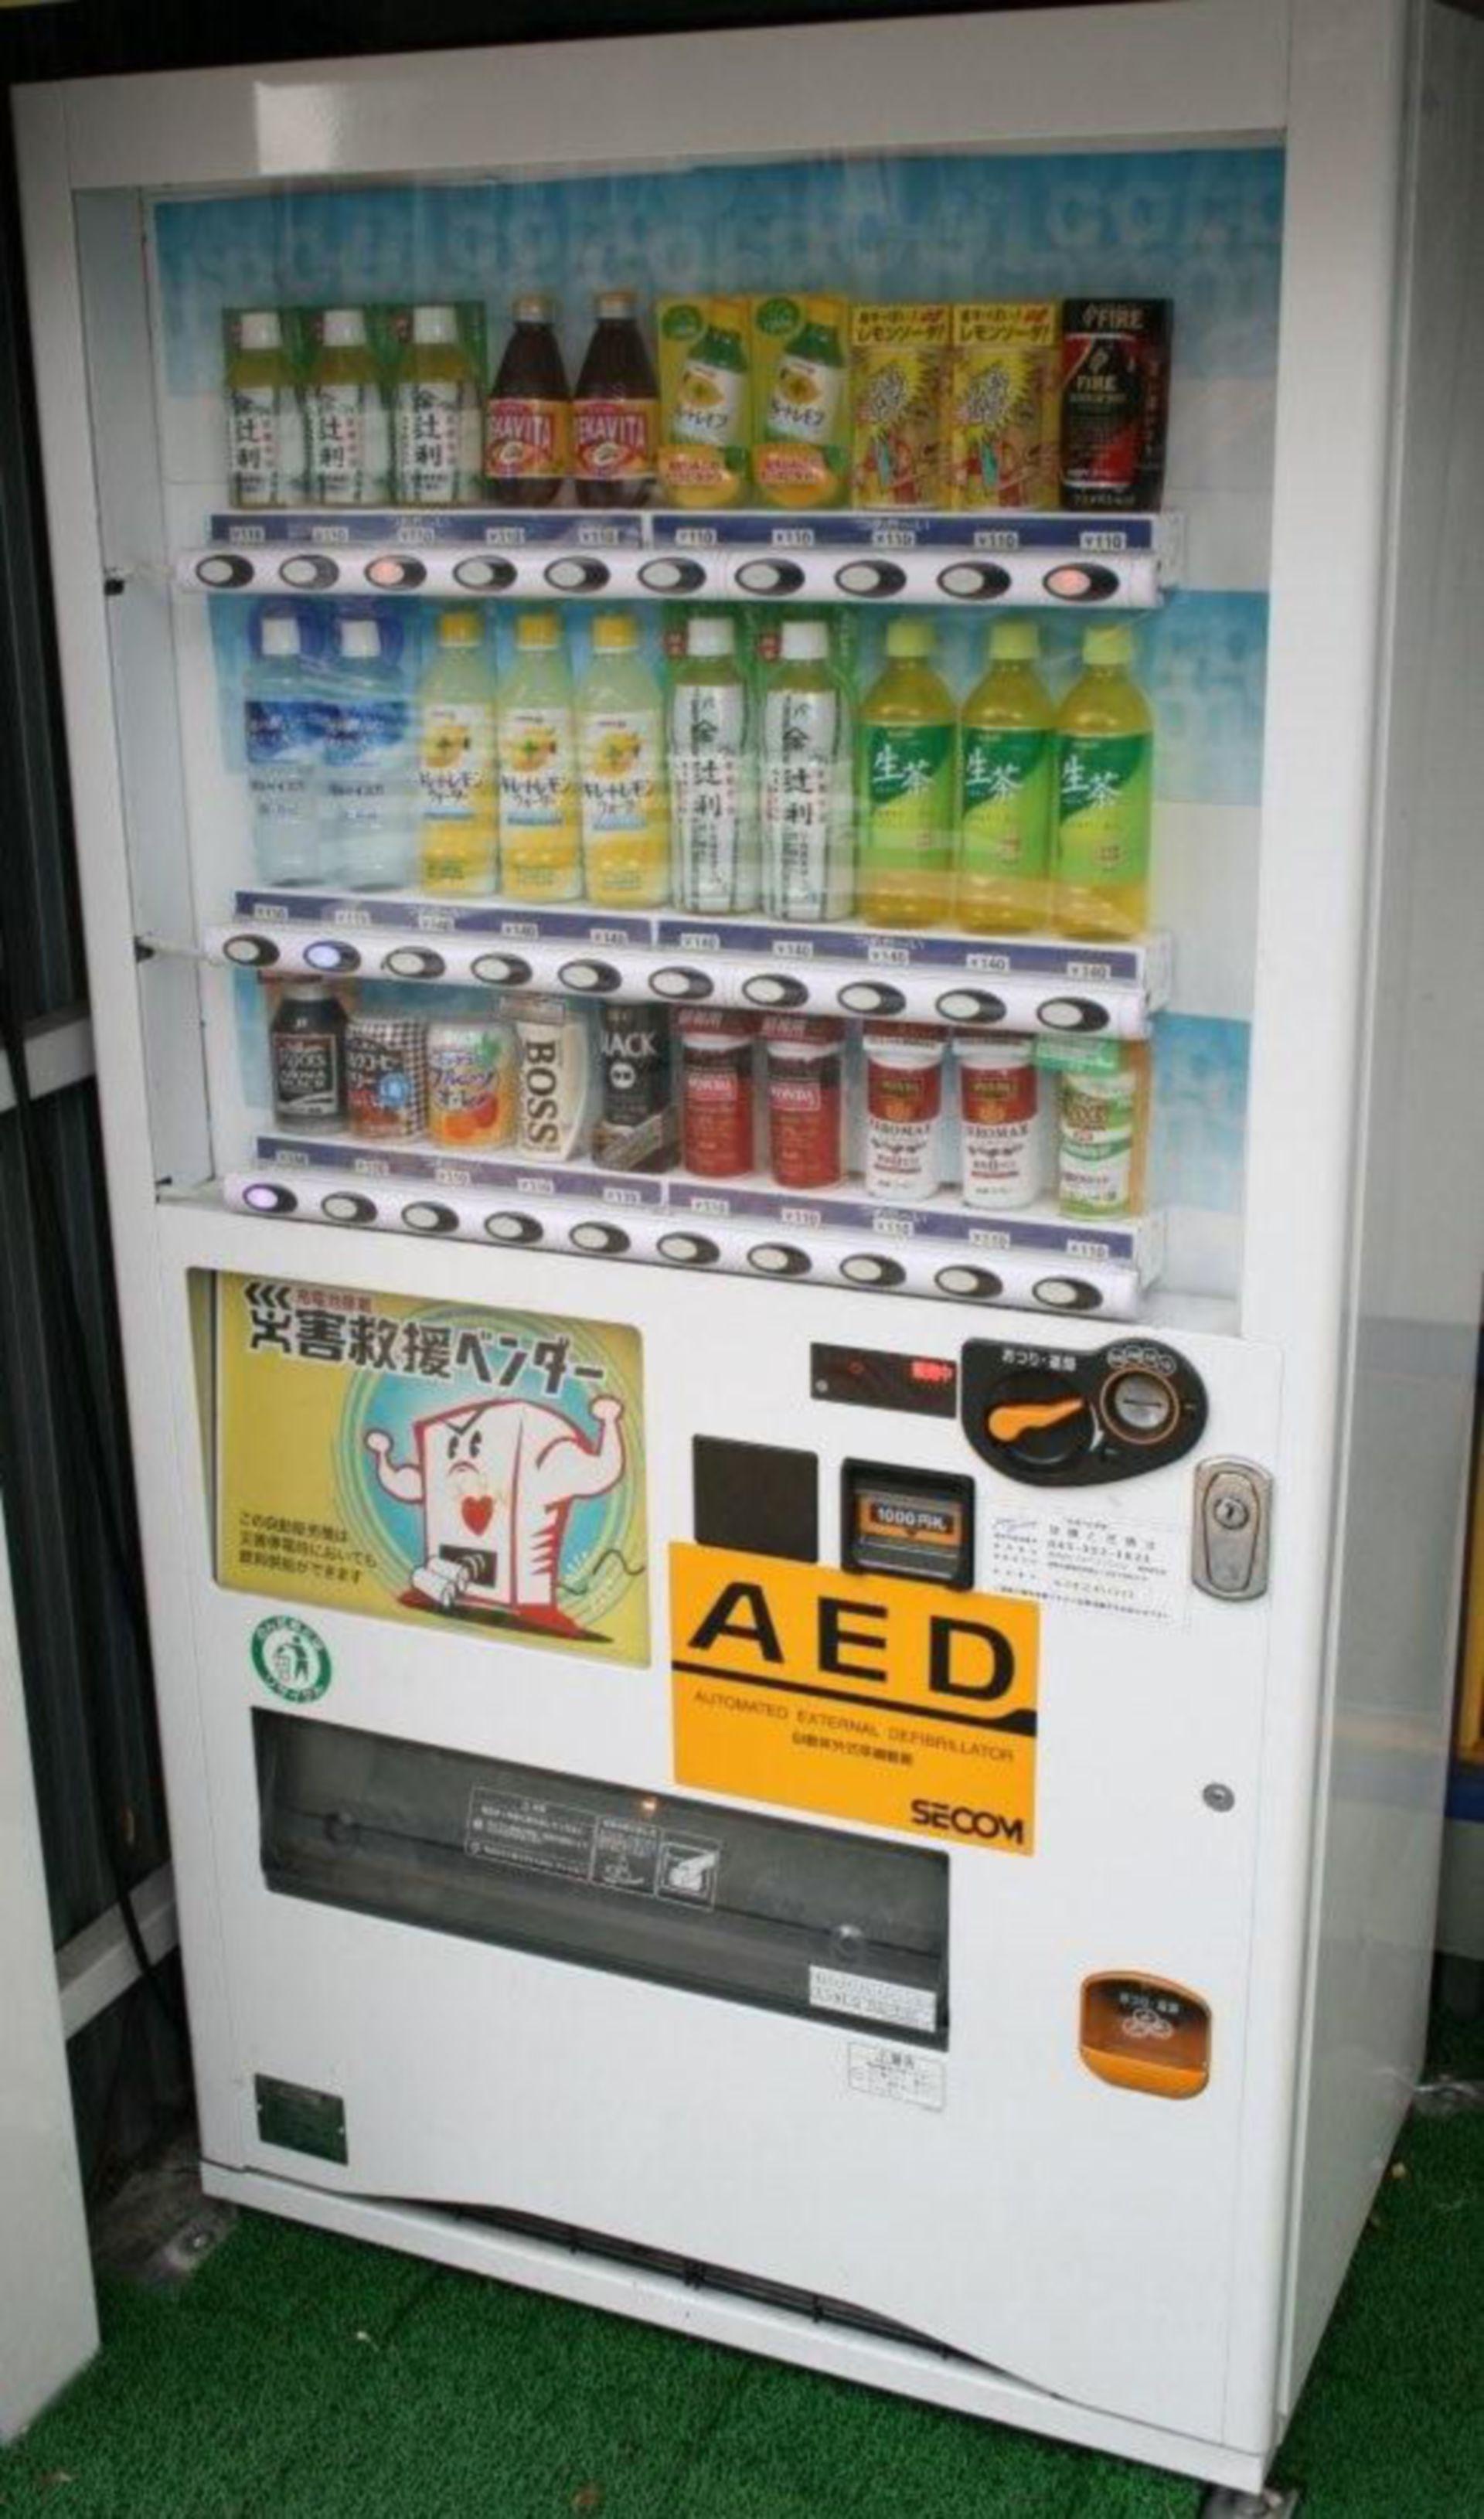 AED in Tokio im Getränkeautomaten